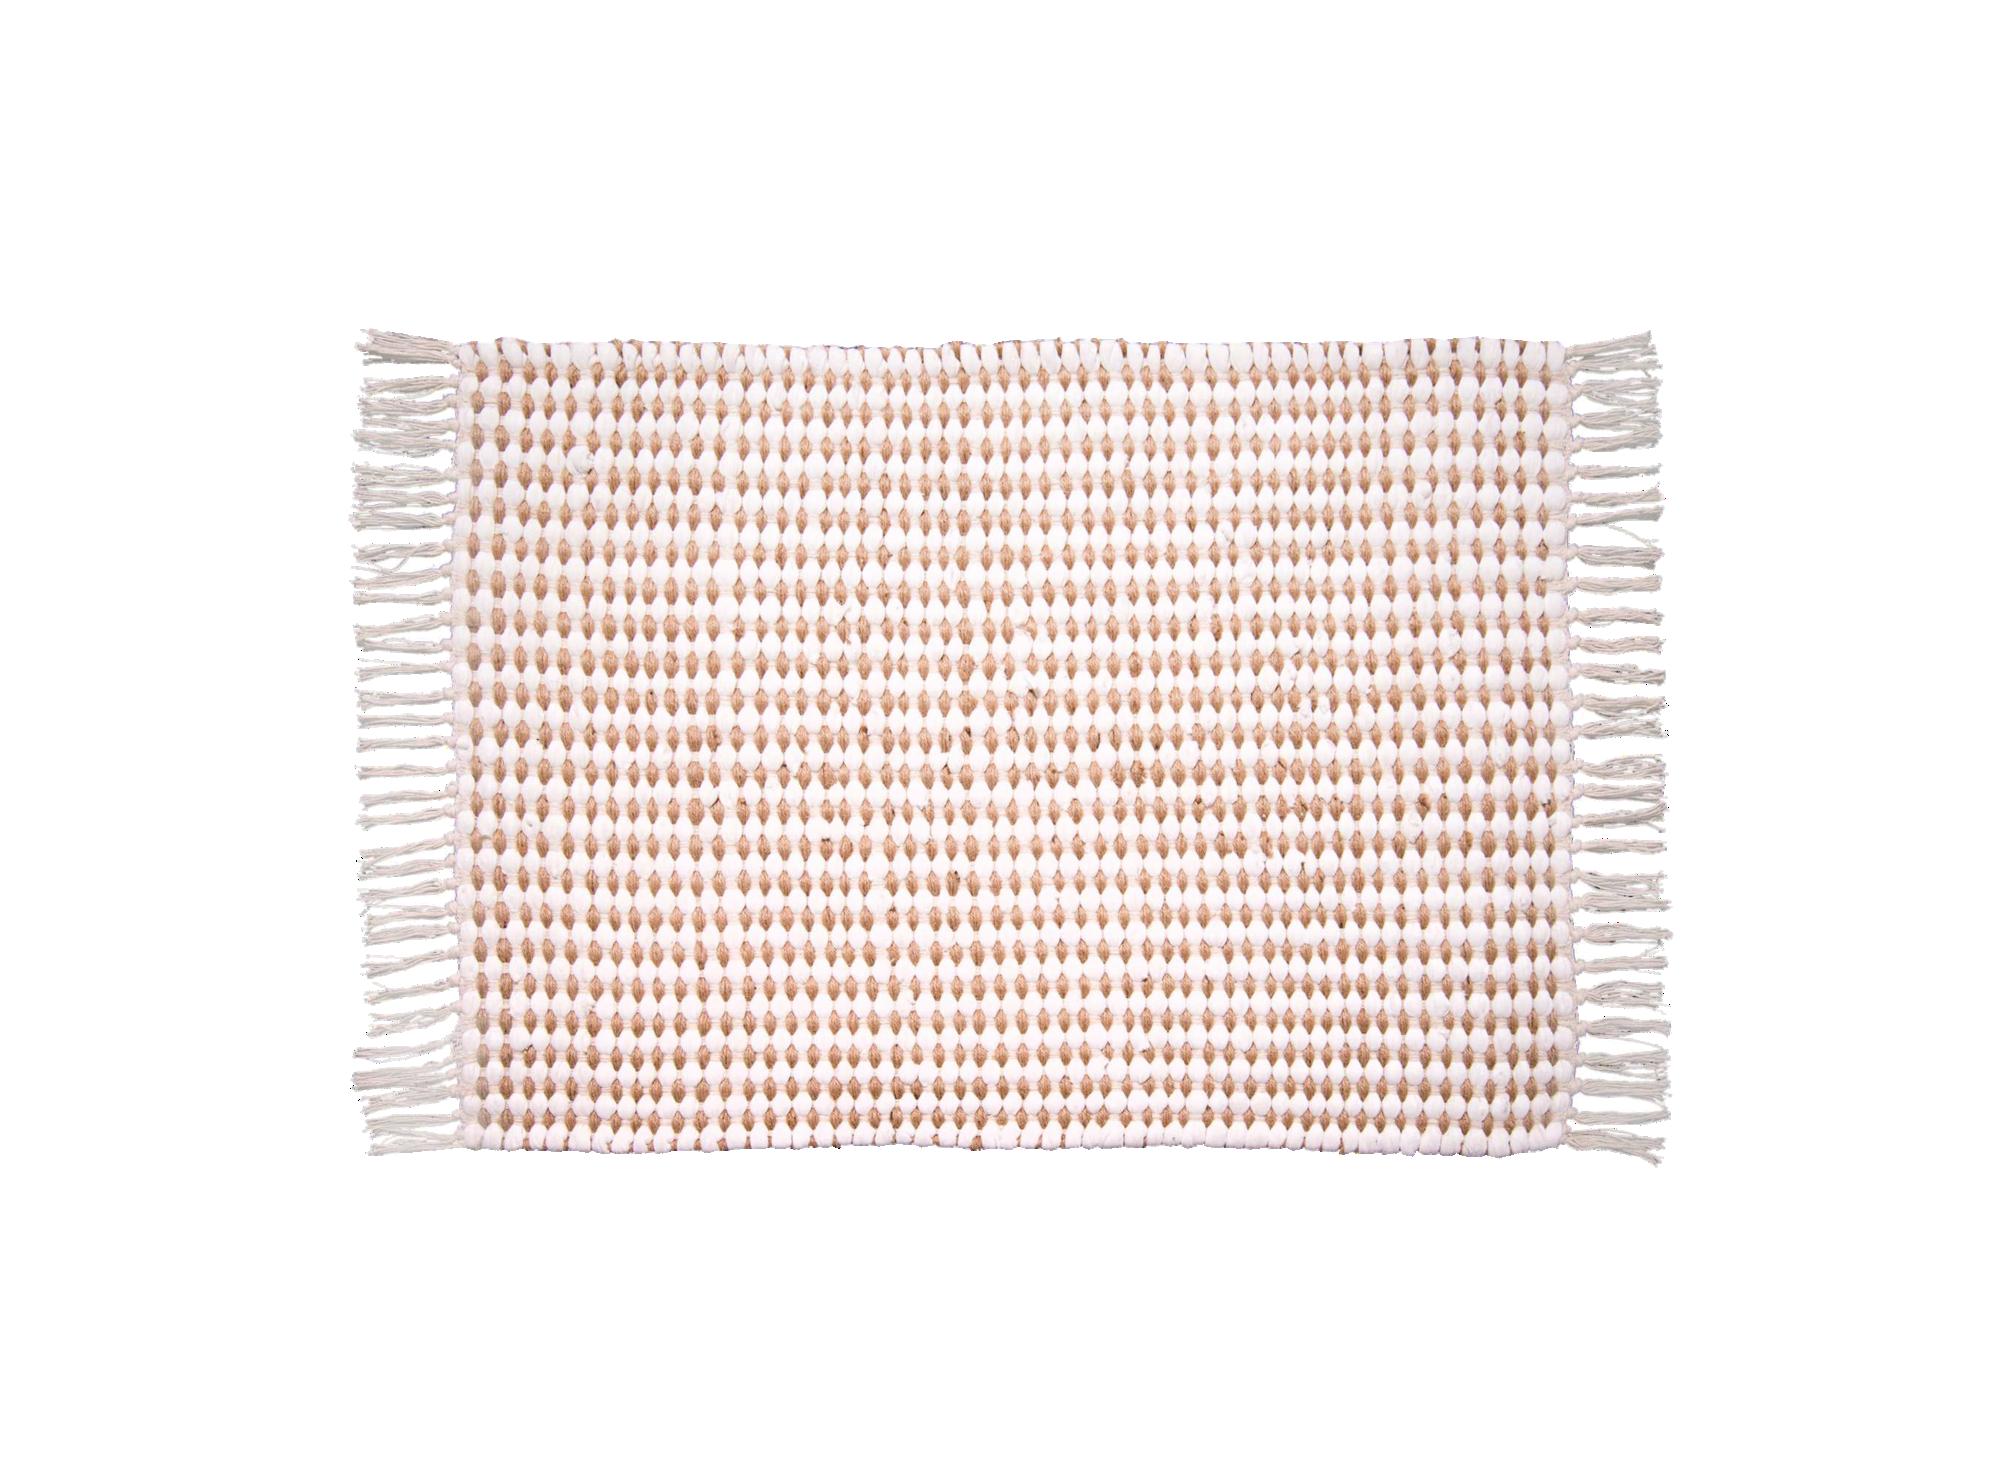 Tapis tufte main coloris naturel/blanc 50% jute, 50% coton dos 100% c ...